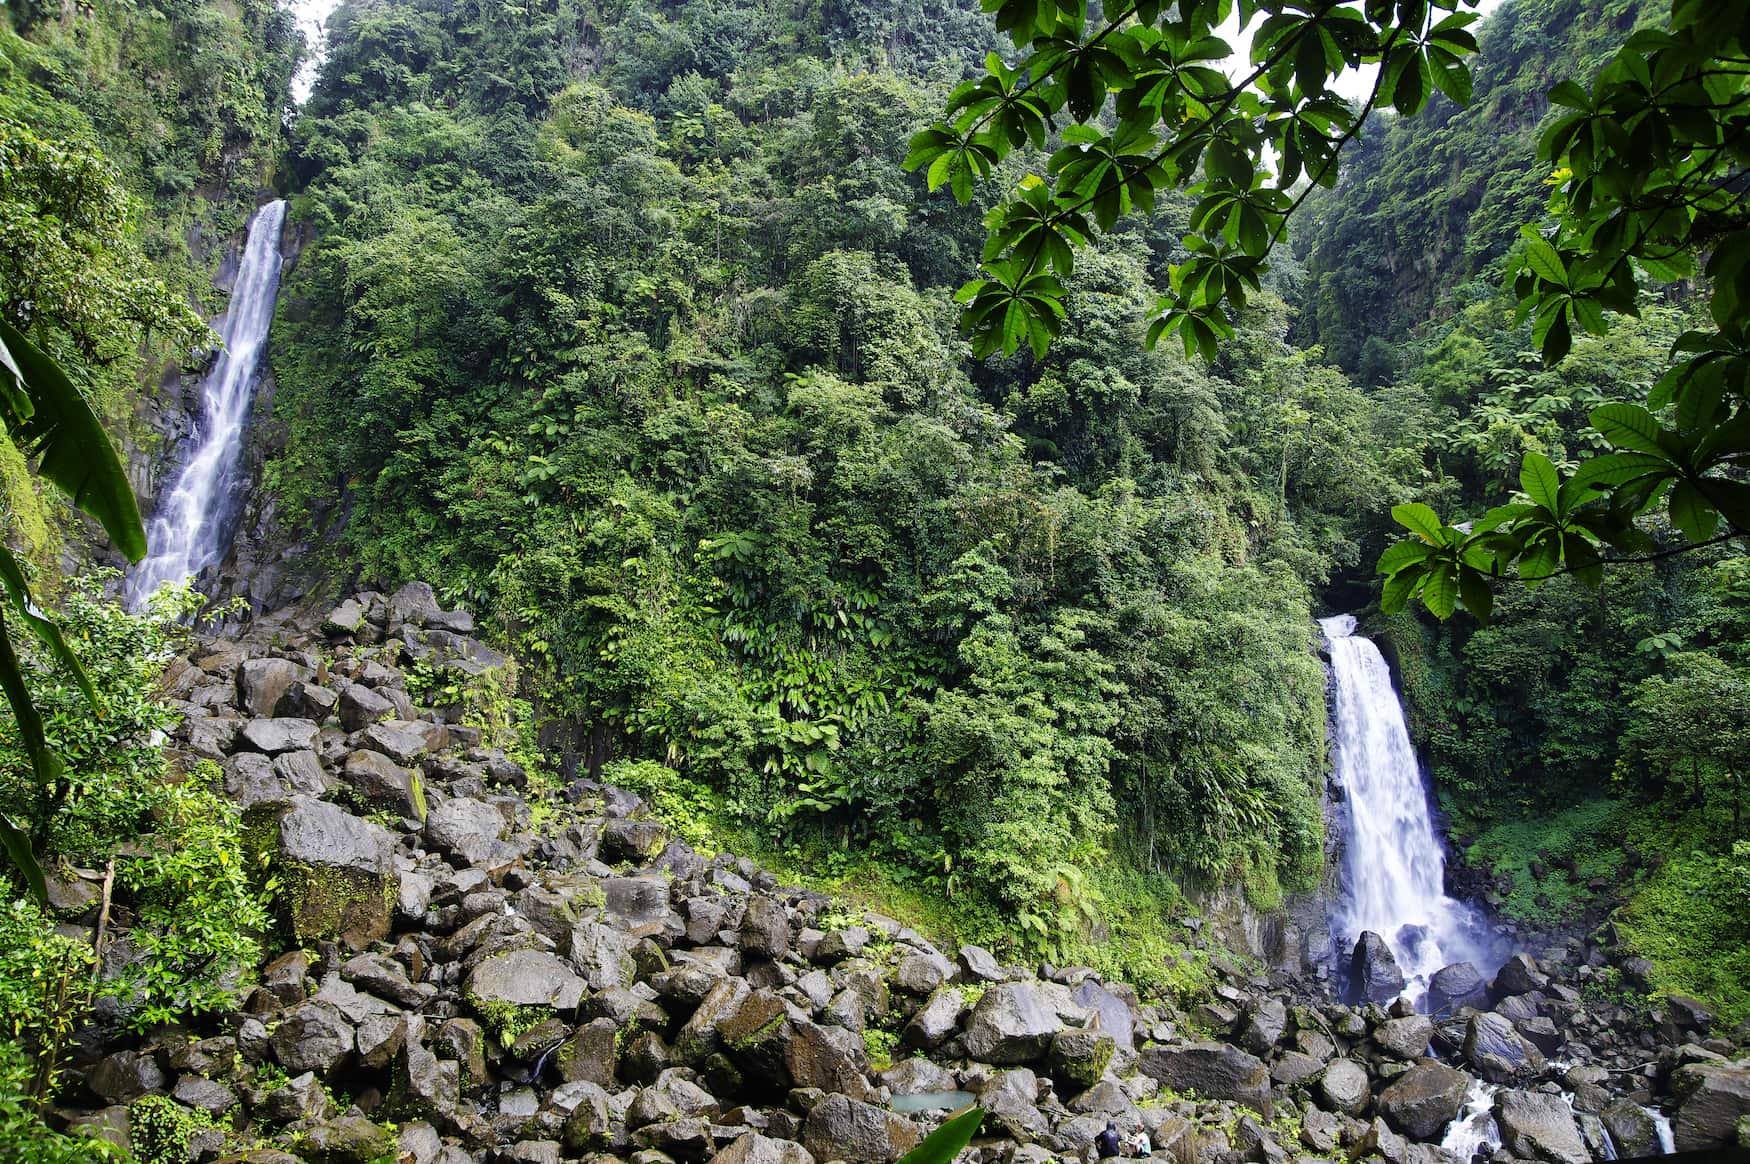 Trafalgar Falls, Morne Trois Pitons Nationalpark (UNESCO Weltkulturerbe), Dominica.